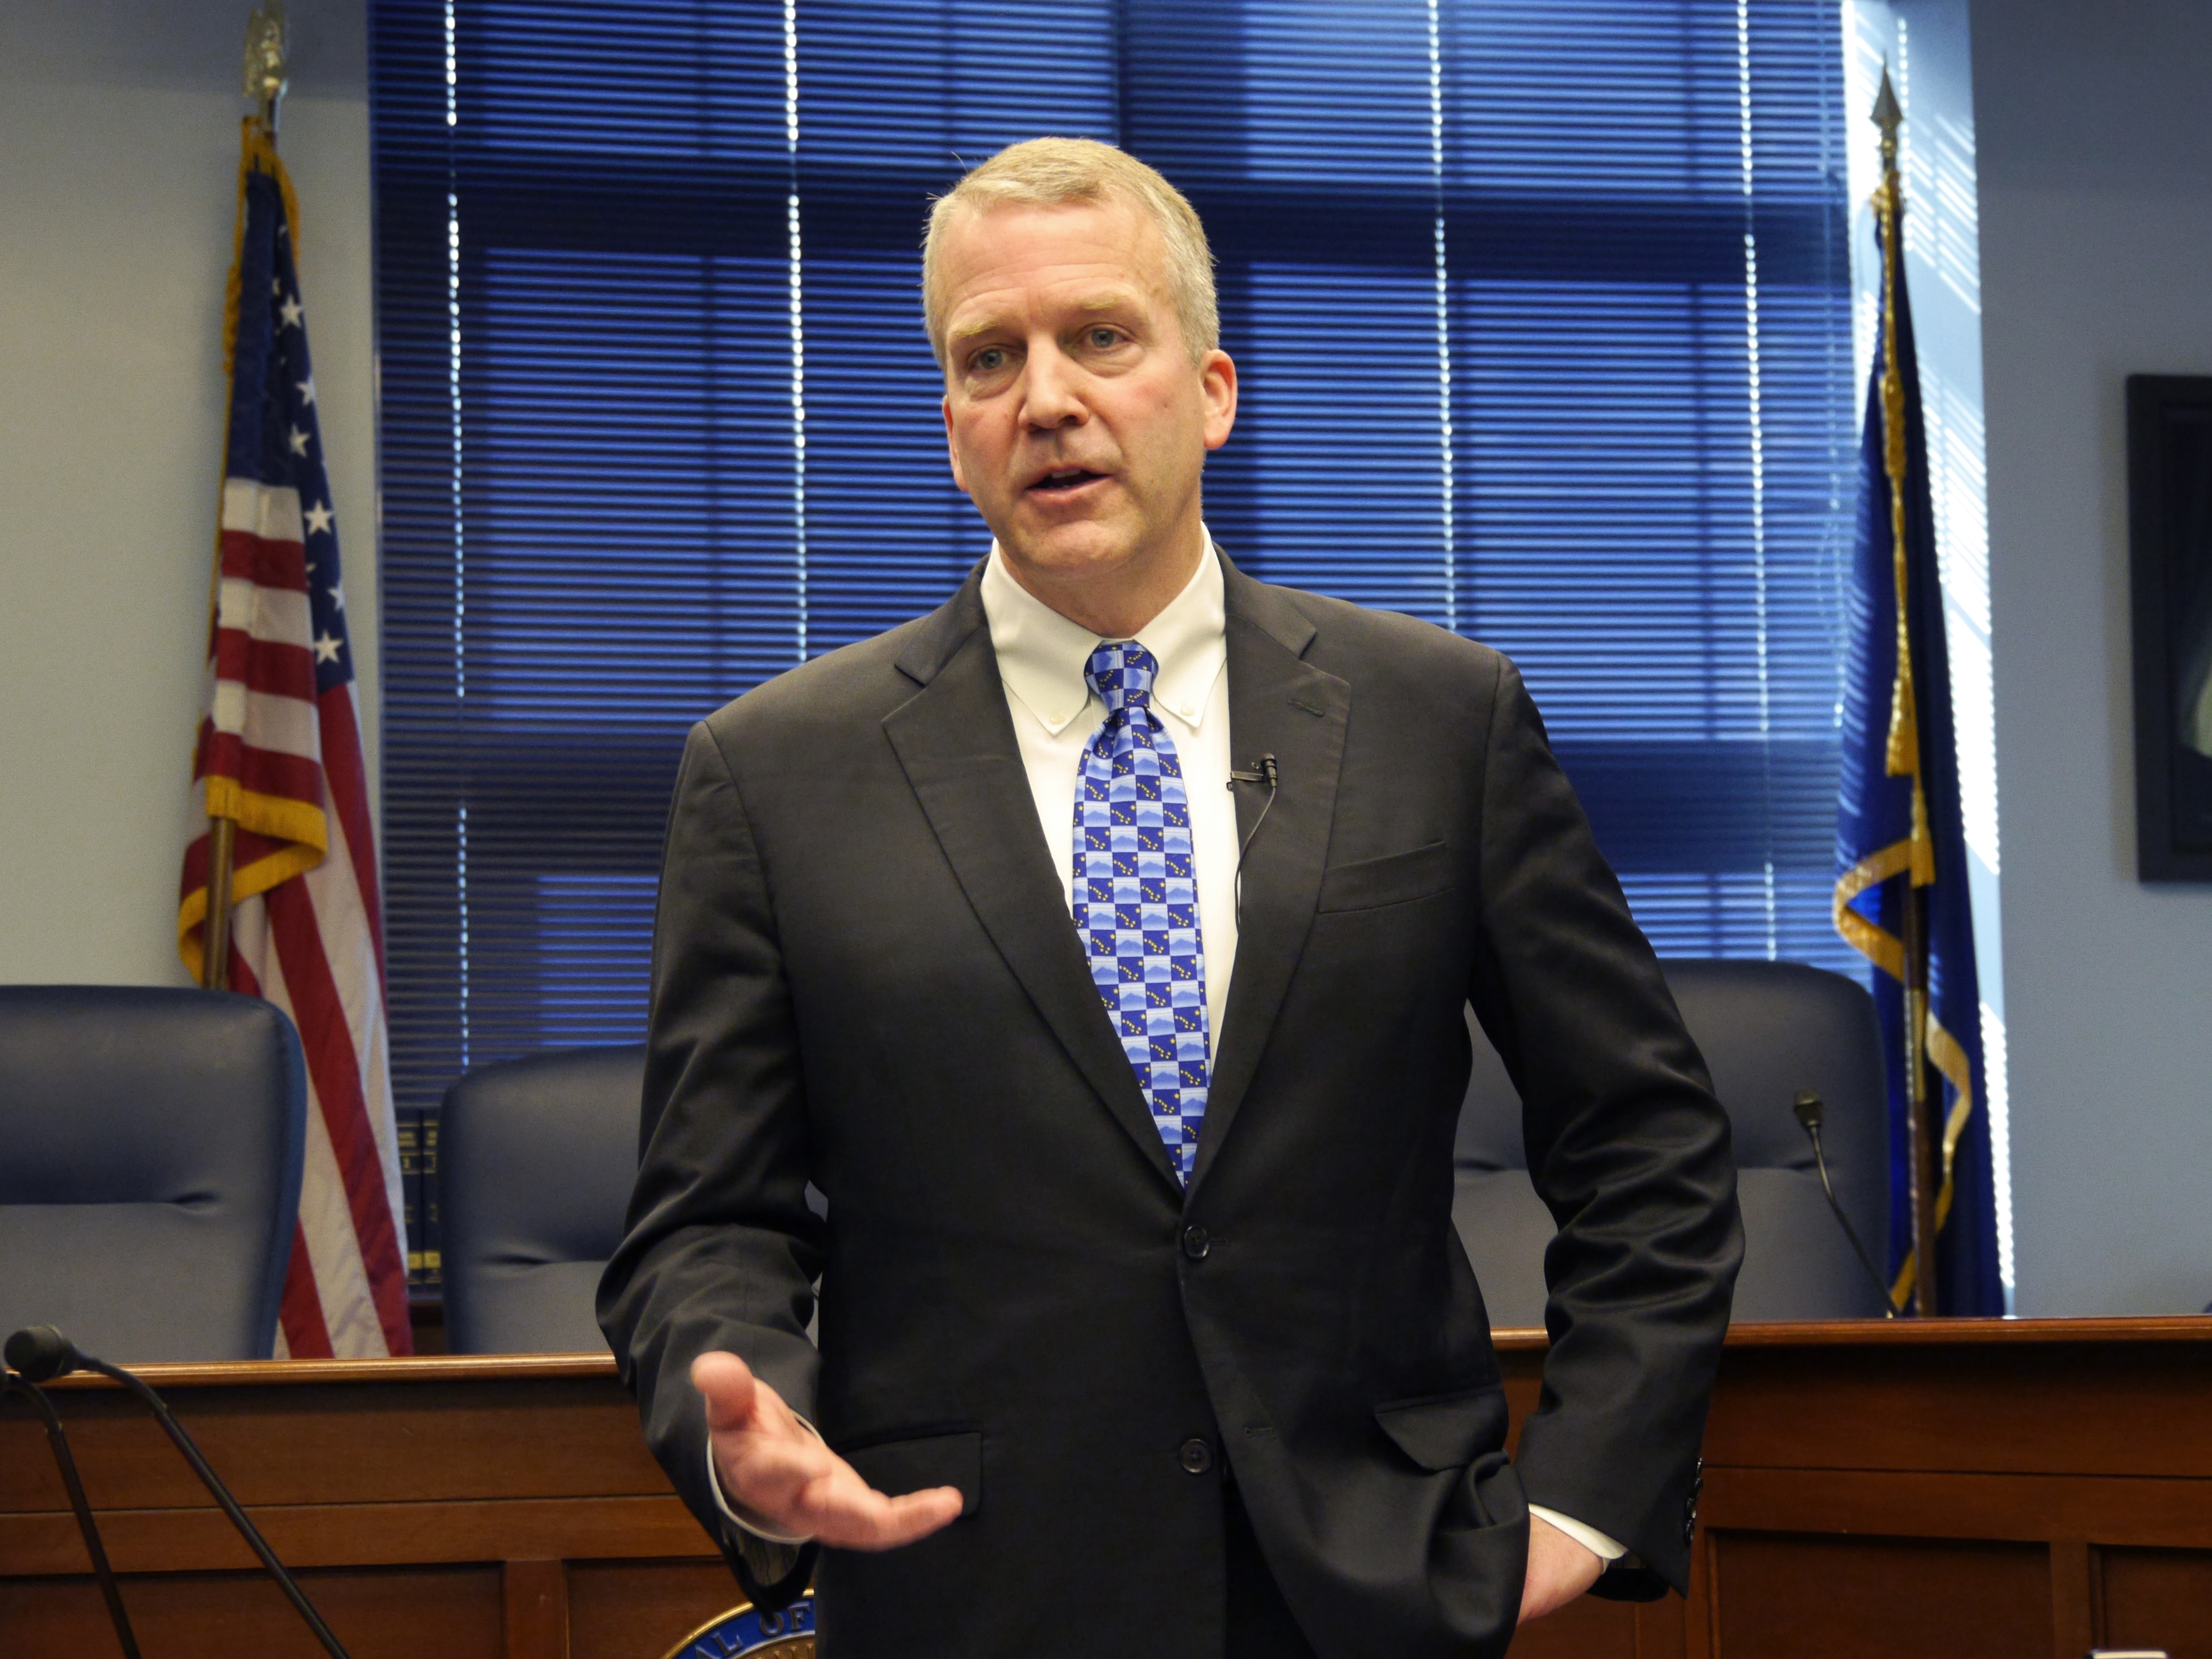 U.S. Senator Dan Sullivan, R-Alaska, at a press availability fol